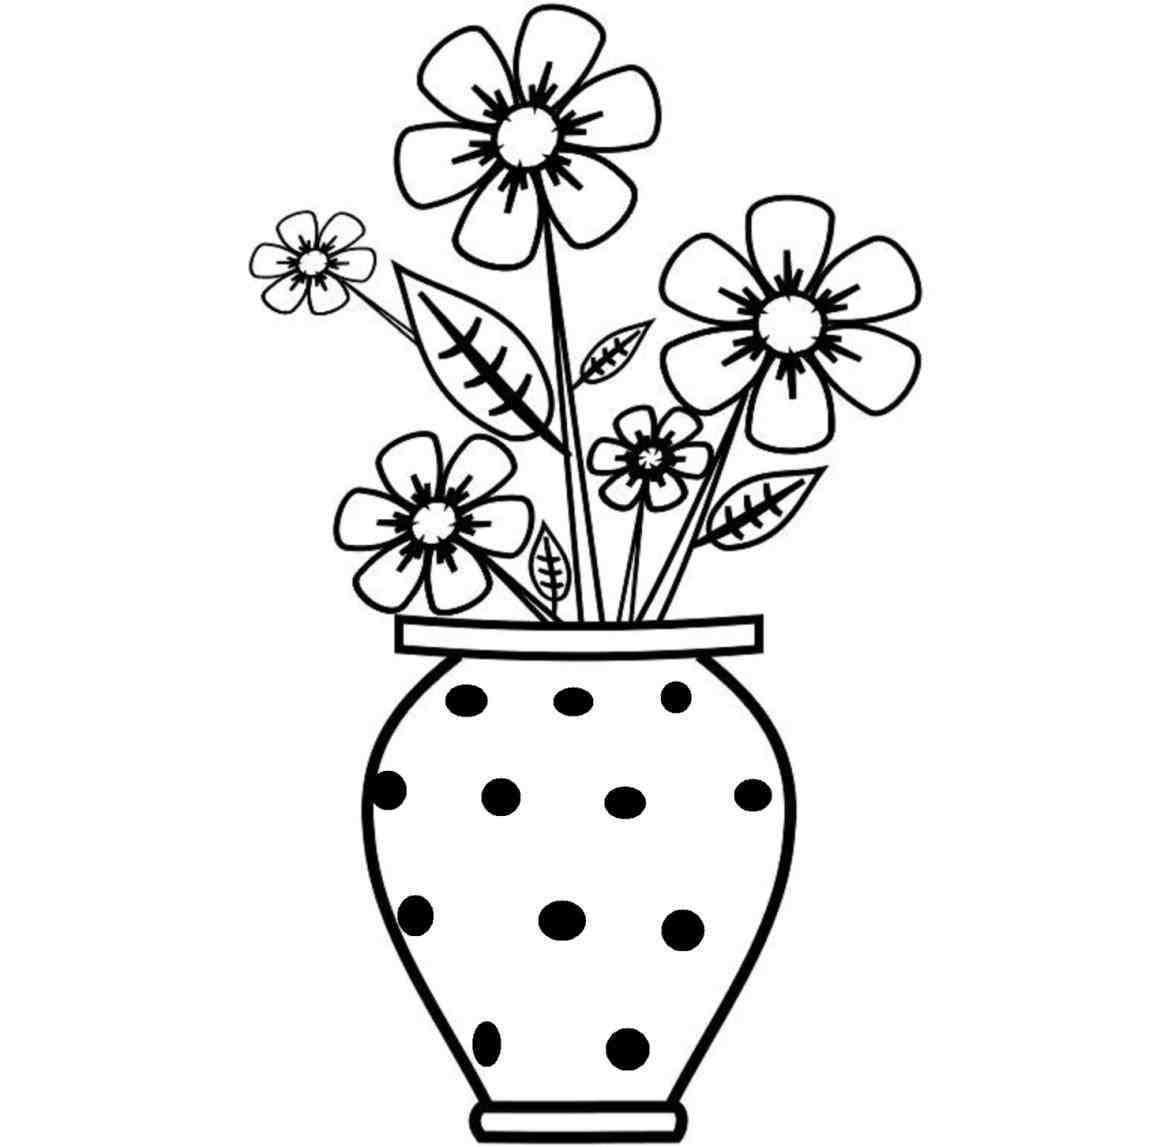 Flower Drawings For Kids Paijo Network Flower Drawing For Kids Flower Vase Drawing Flower Drawing